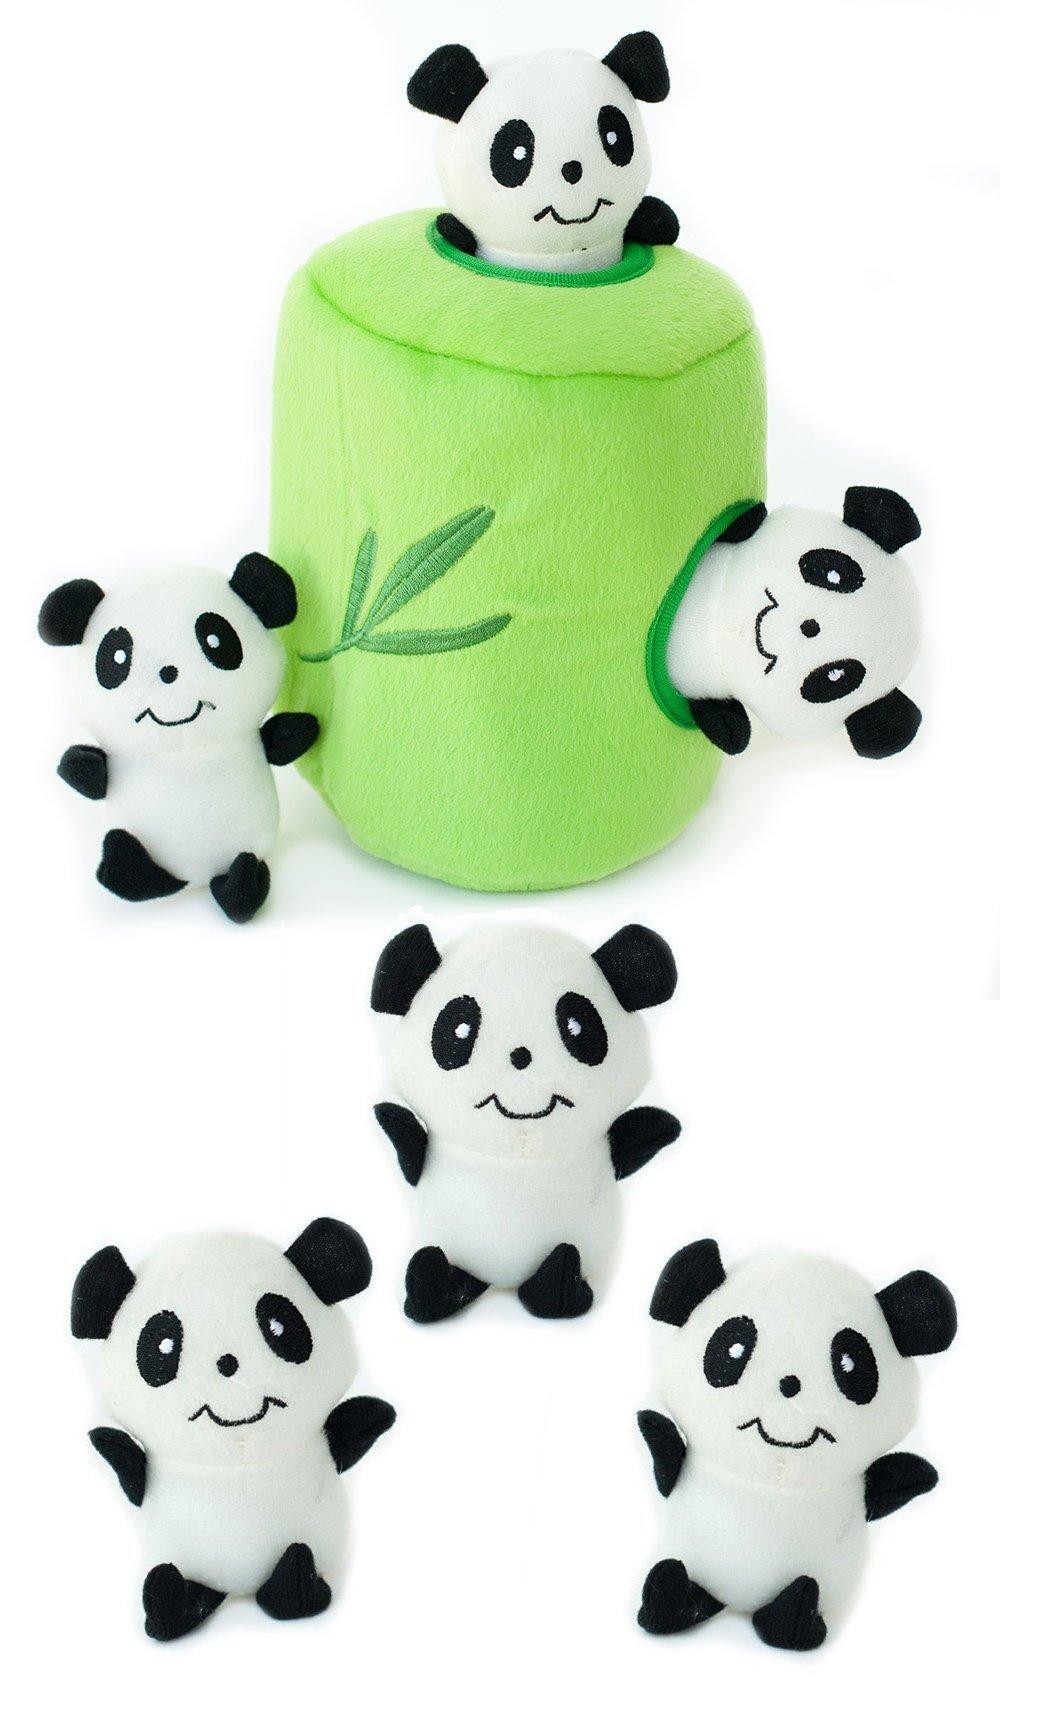 ZippyPaws Panda 'n Bamboo Burrow Toy with 3 Pandas, Plus 3 Extra Panda Refills